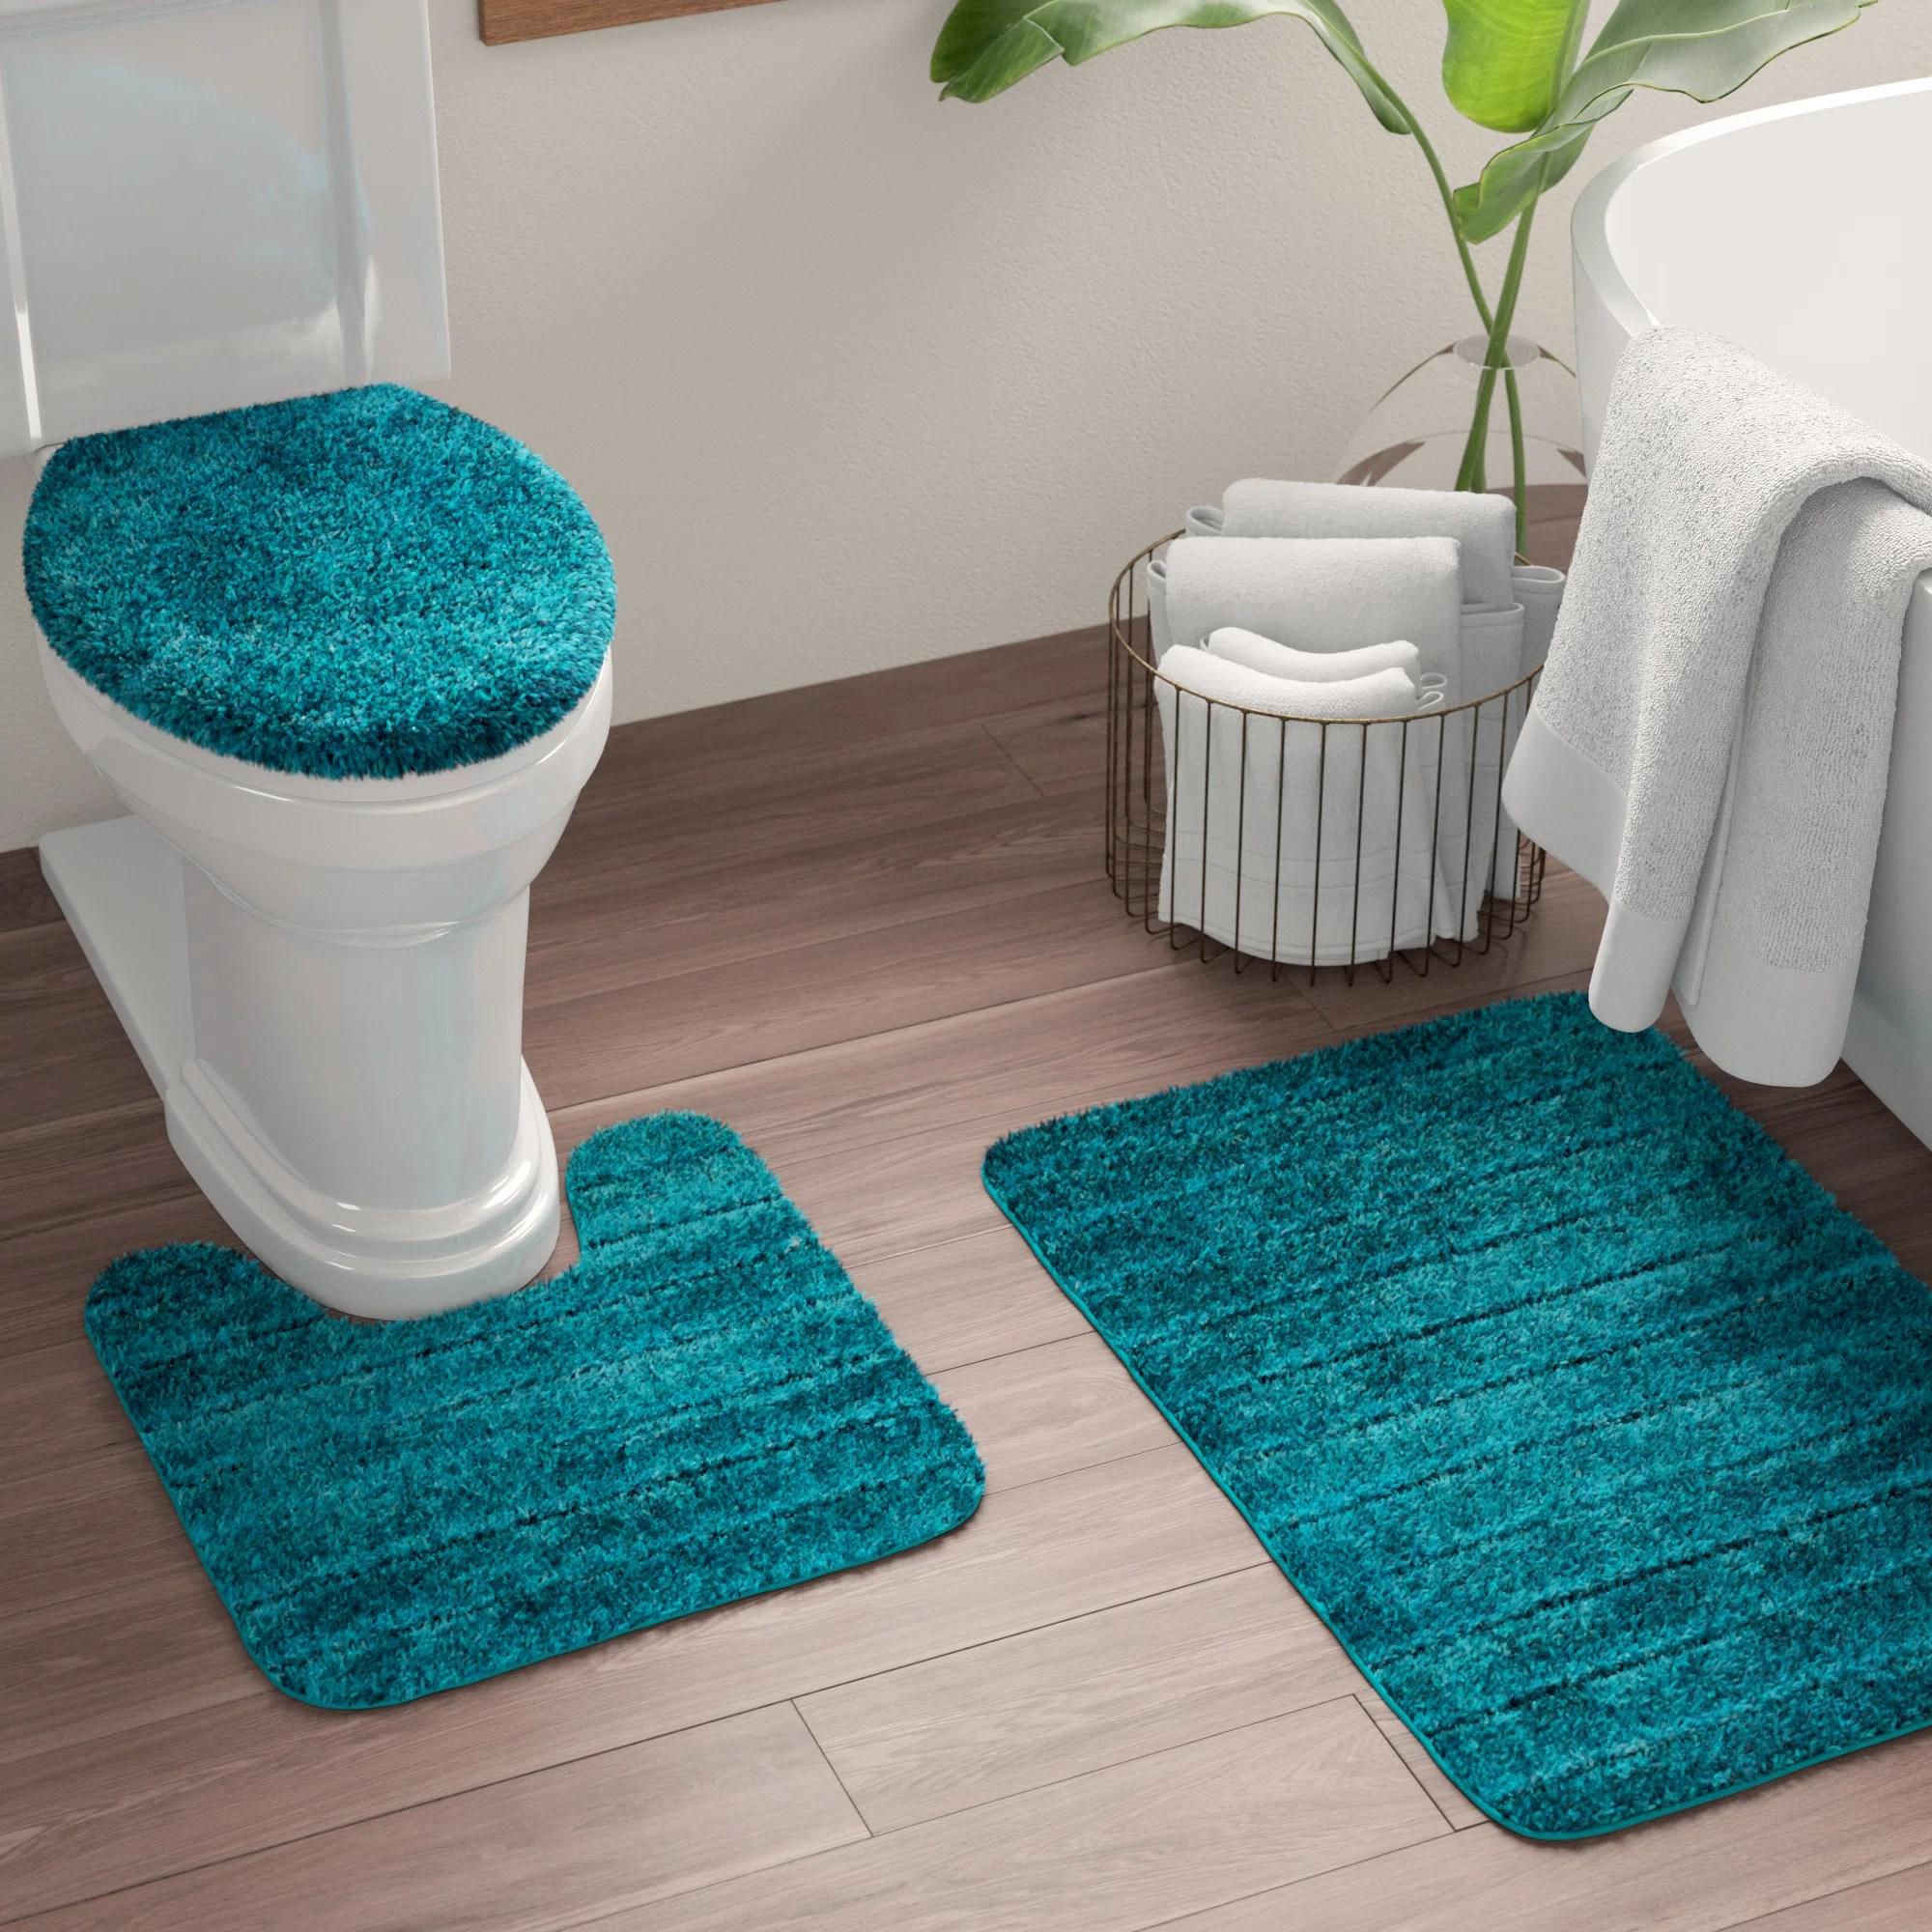 Colorful Bathroom Bath Rugs Mats You Ll Love In 2020 Wayfair